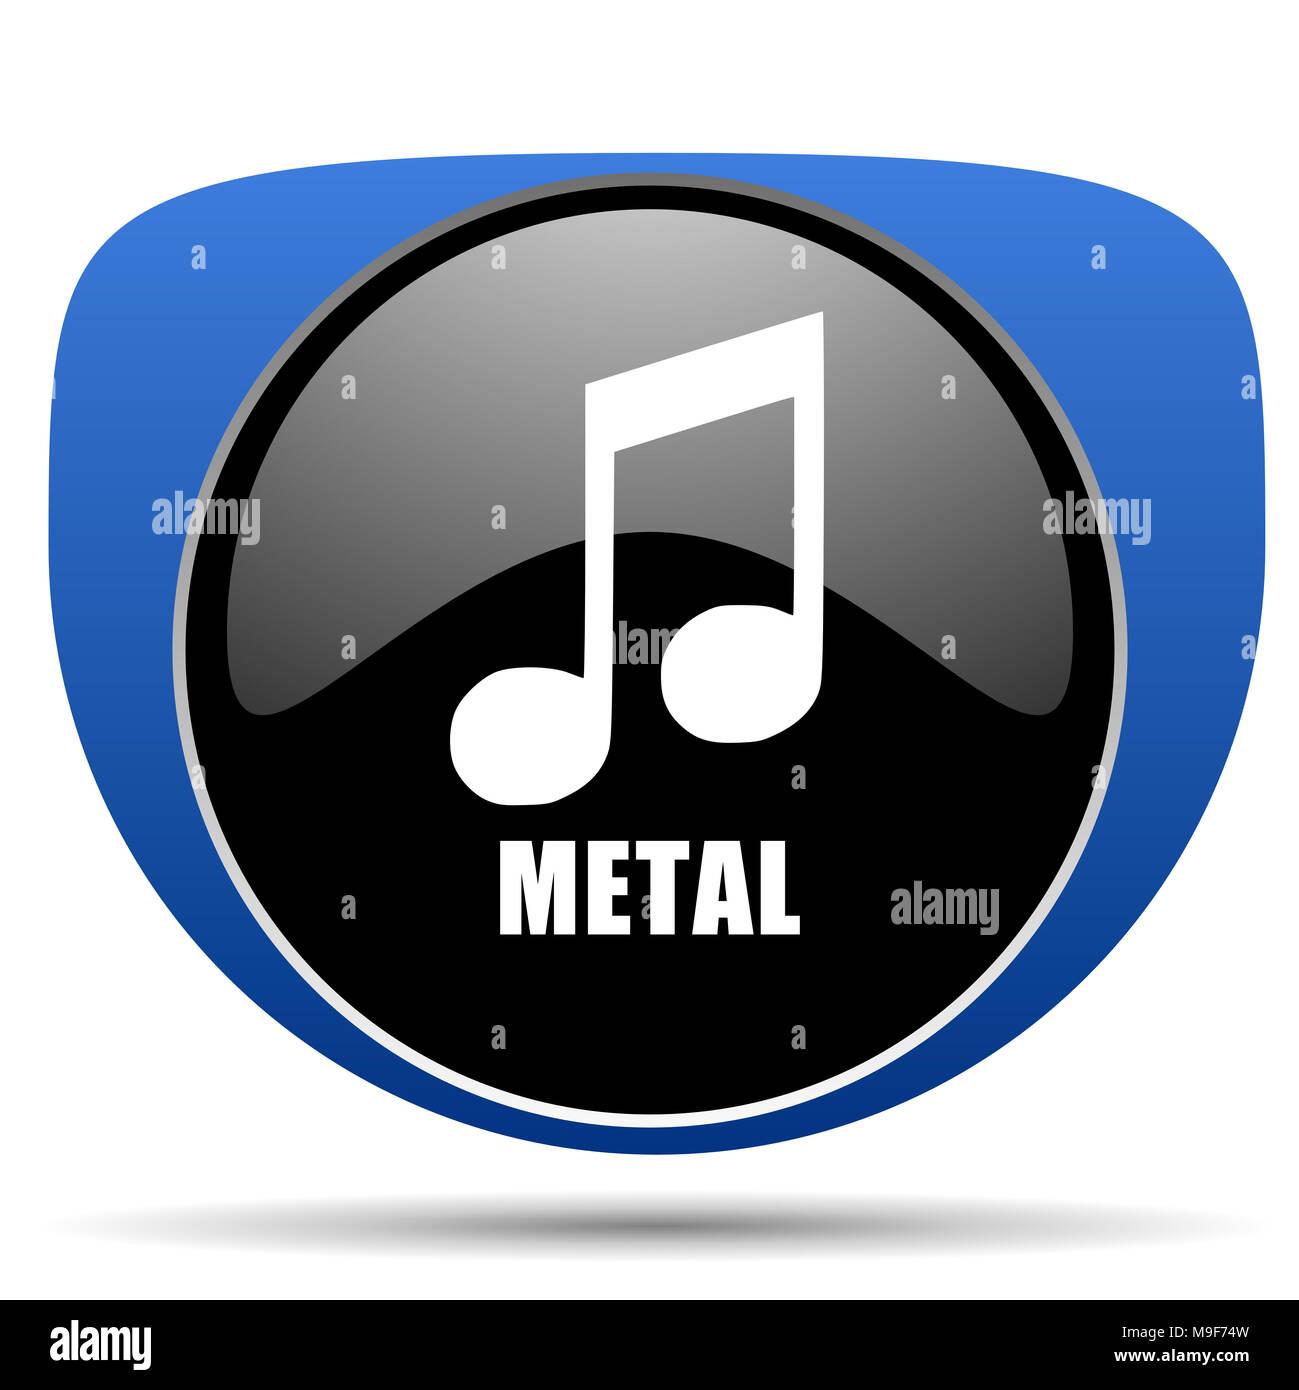 Metal music web icon - Stock Image